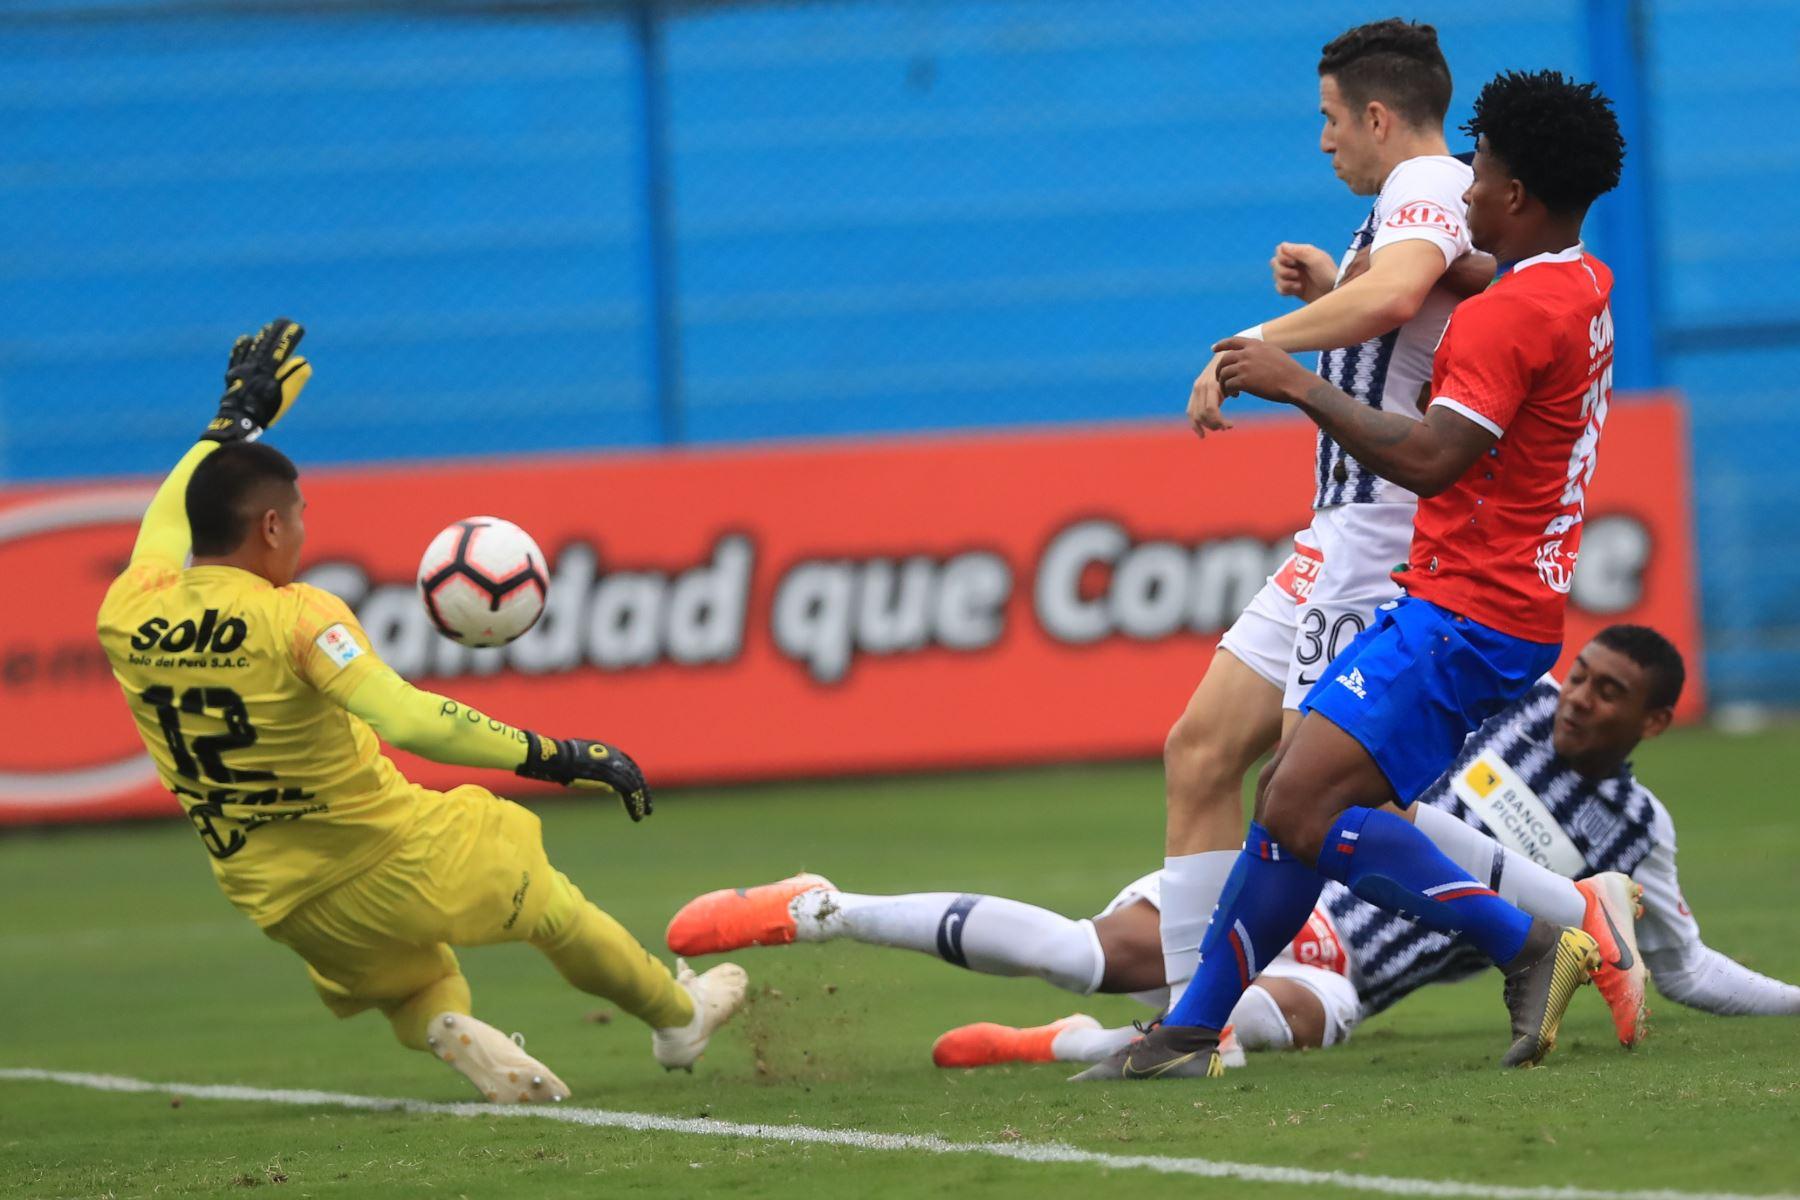 Alianza Lima empató 1-1 ante Unión Comercio   Foto: ANDINA/Juan Carlos Guzmán Negrini.